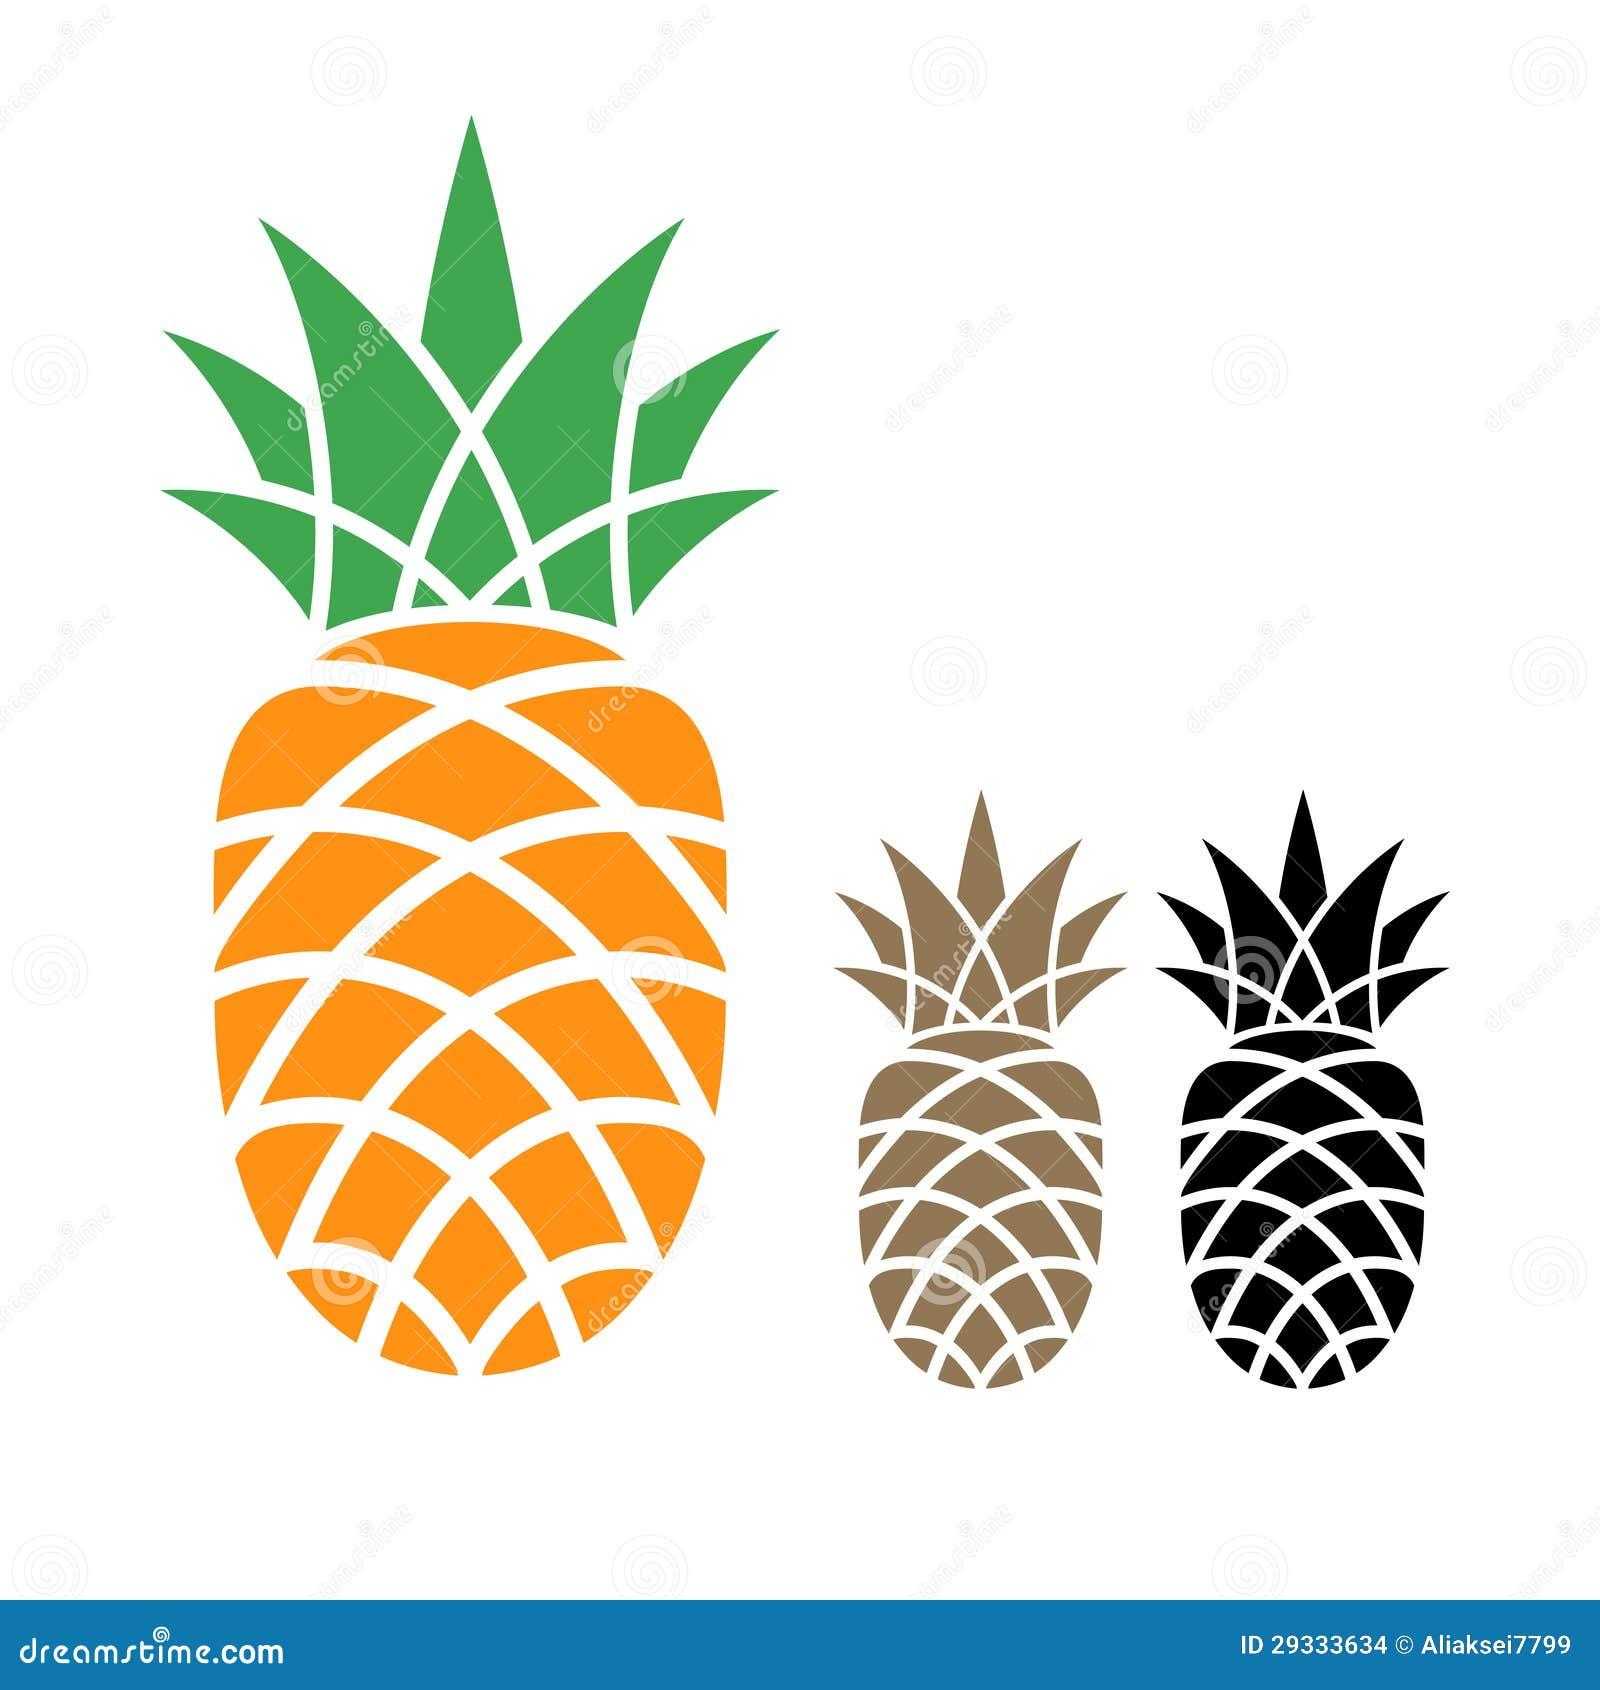 Pineapple stock vector. Illustration of graphic, garden ...